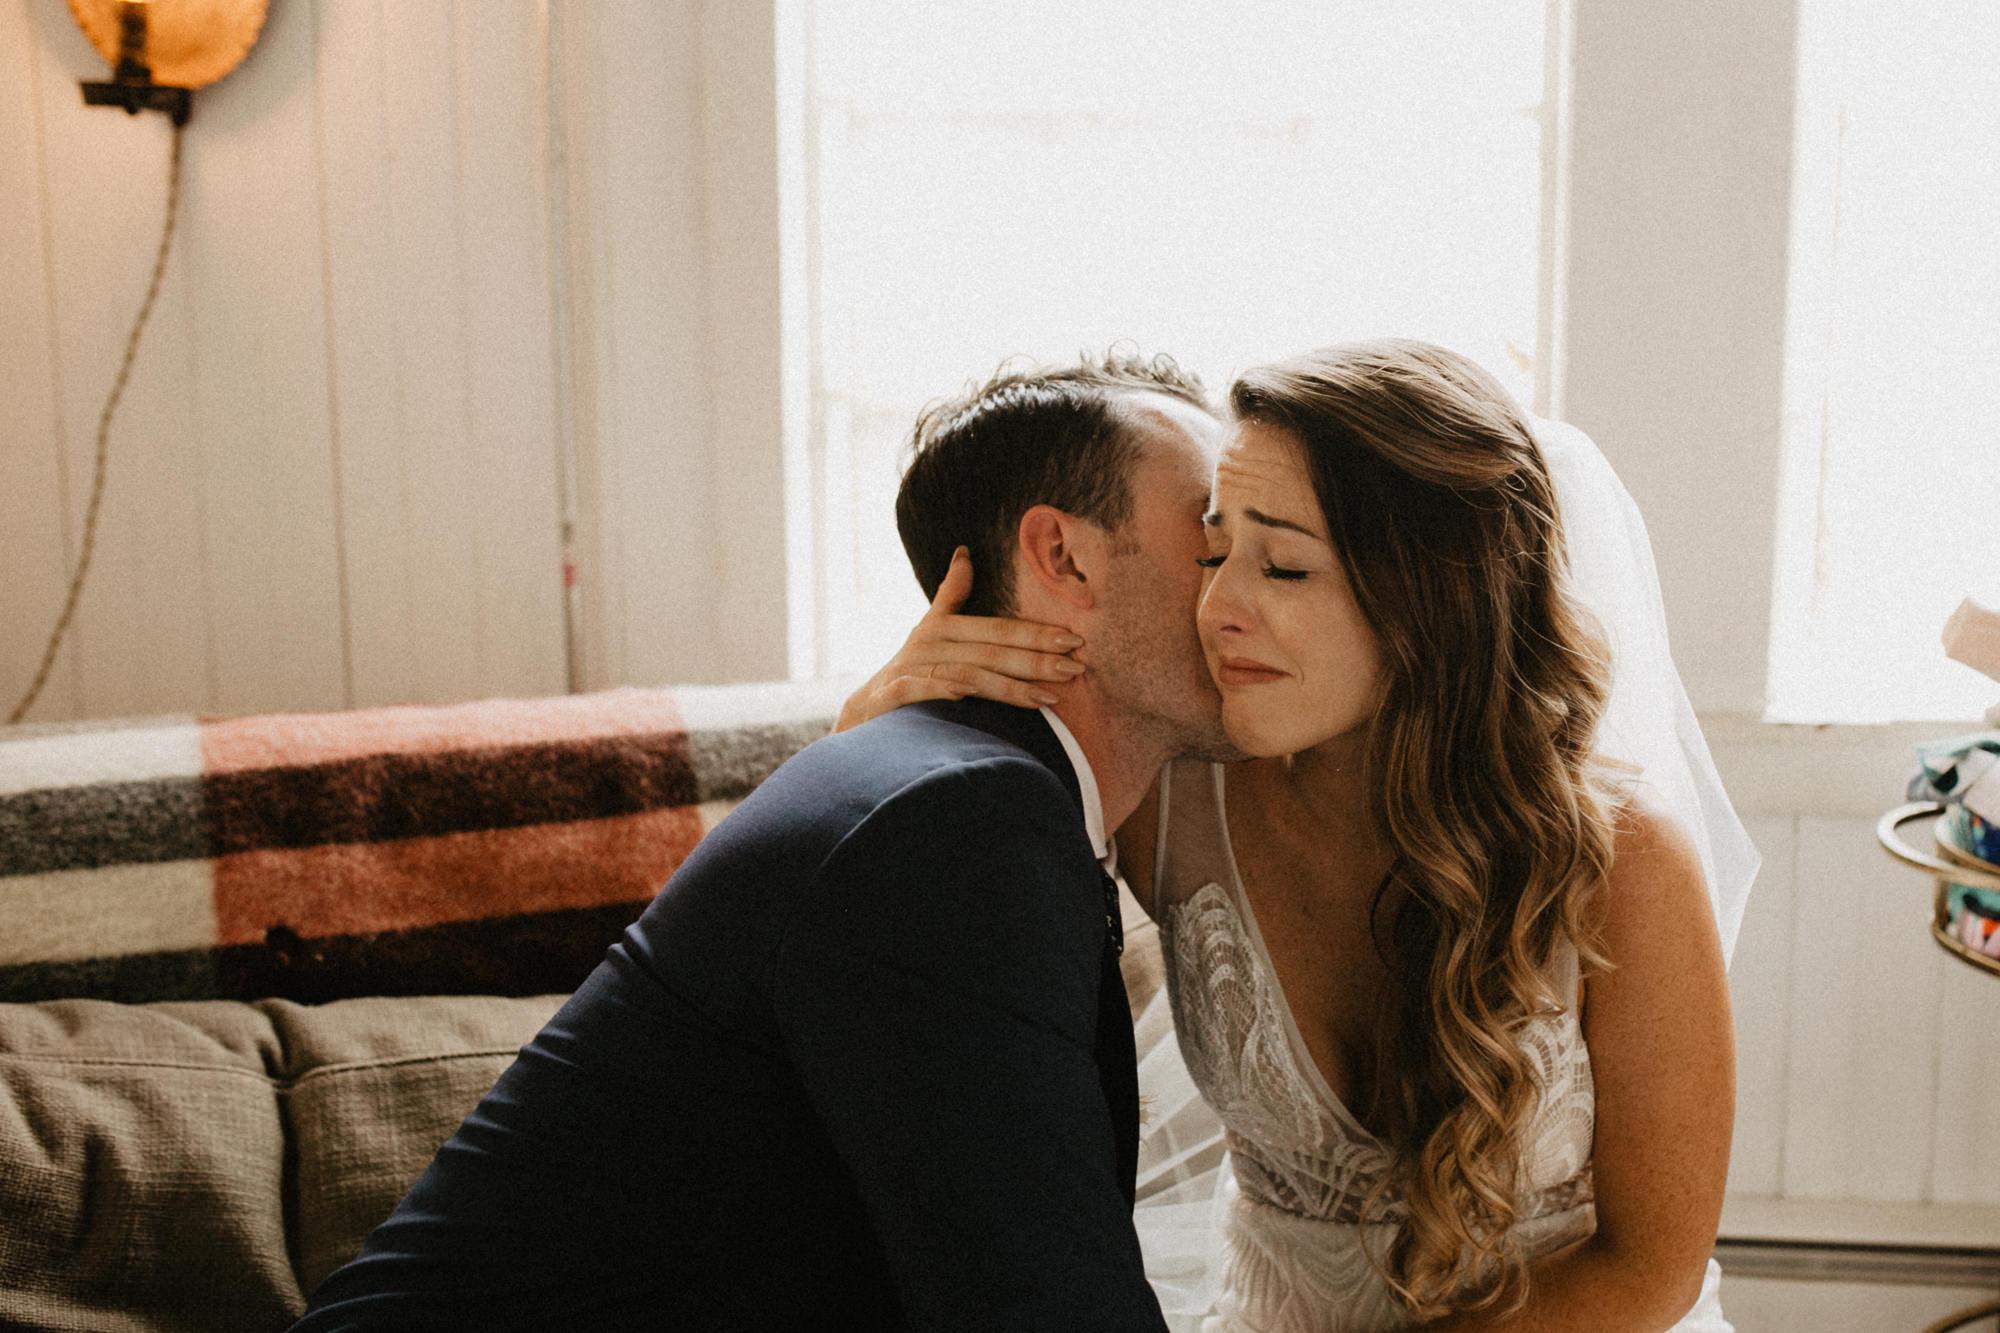 terrain-events-wedding-photographer-35.jpg